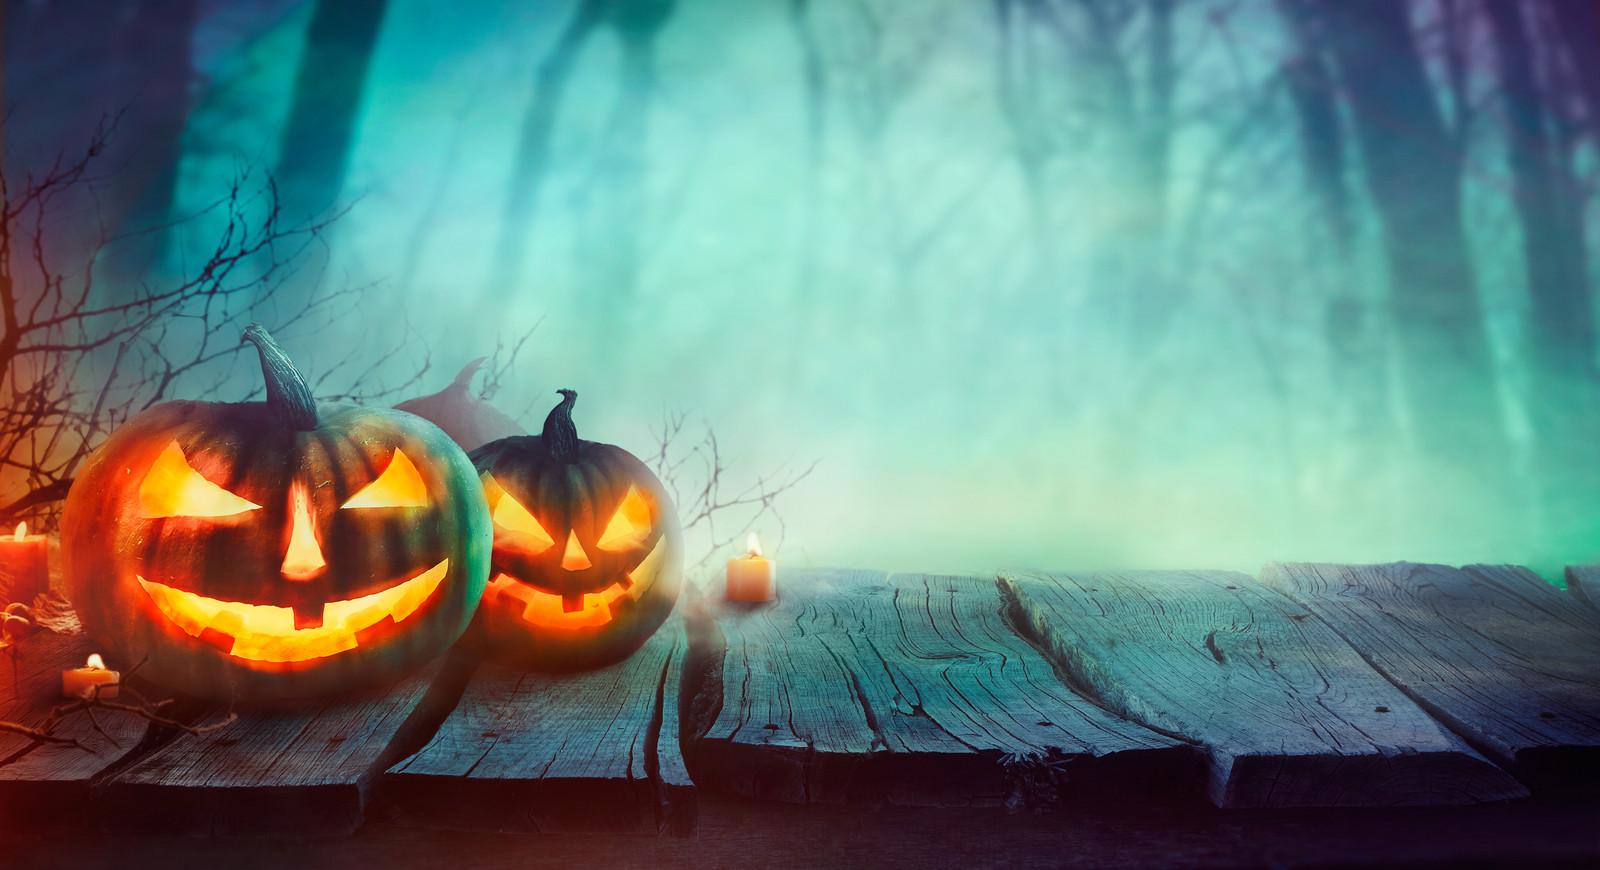 Hallowe'en scene